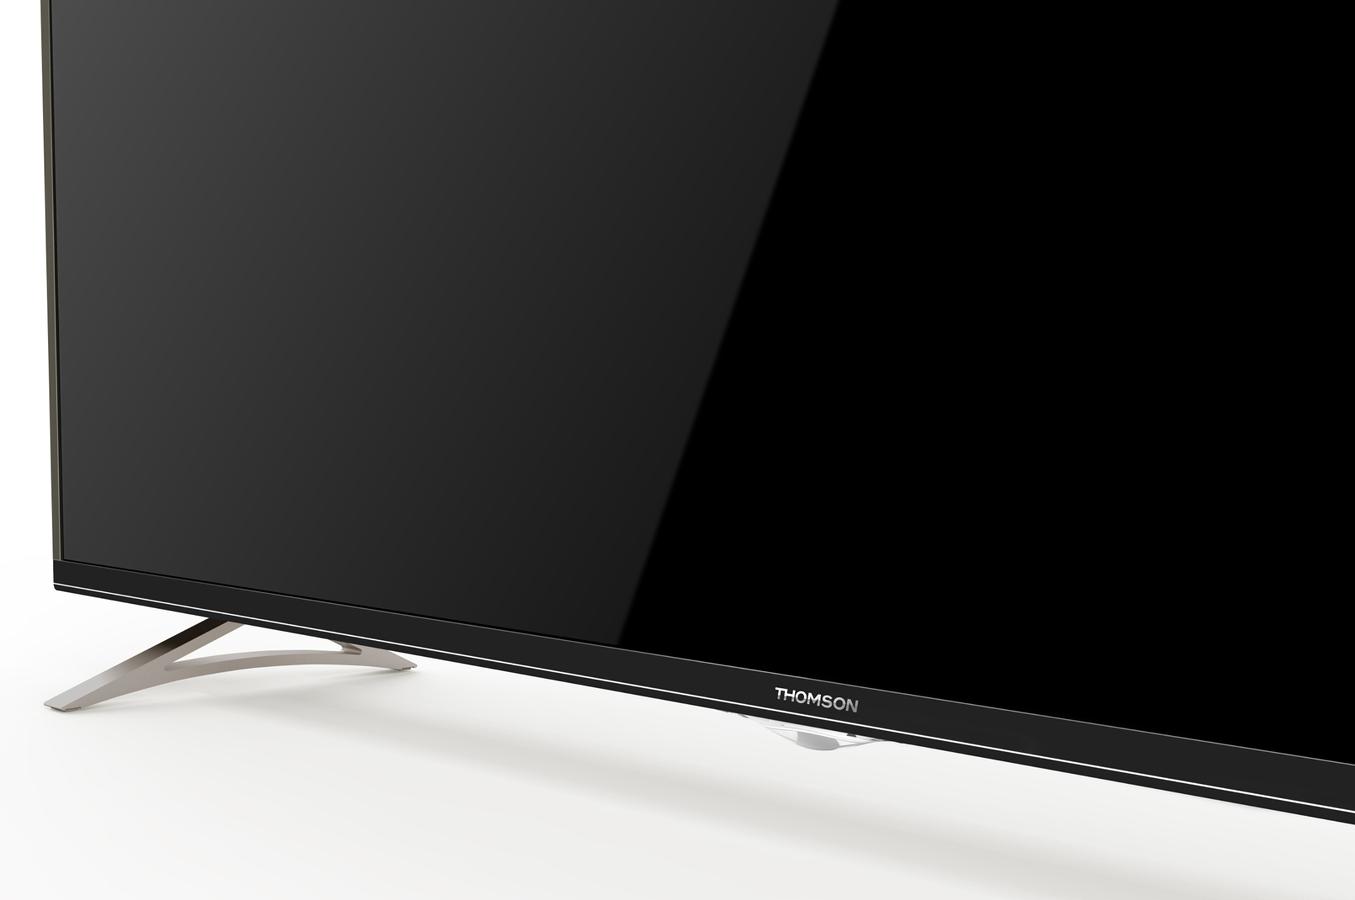 tv led thomson 40ub6406 4k uhd 4235398 darty. Black Bedroom Furniture Sets. Home Design Ideas